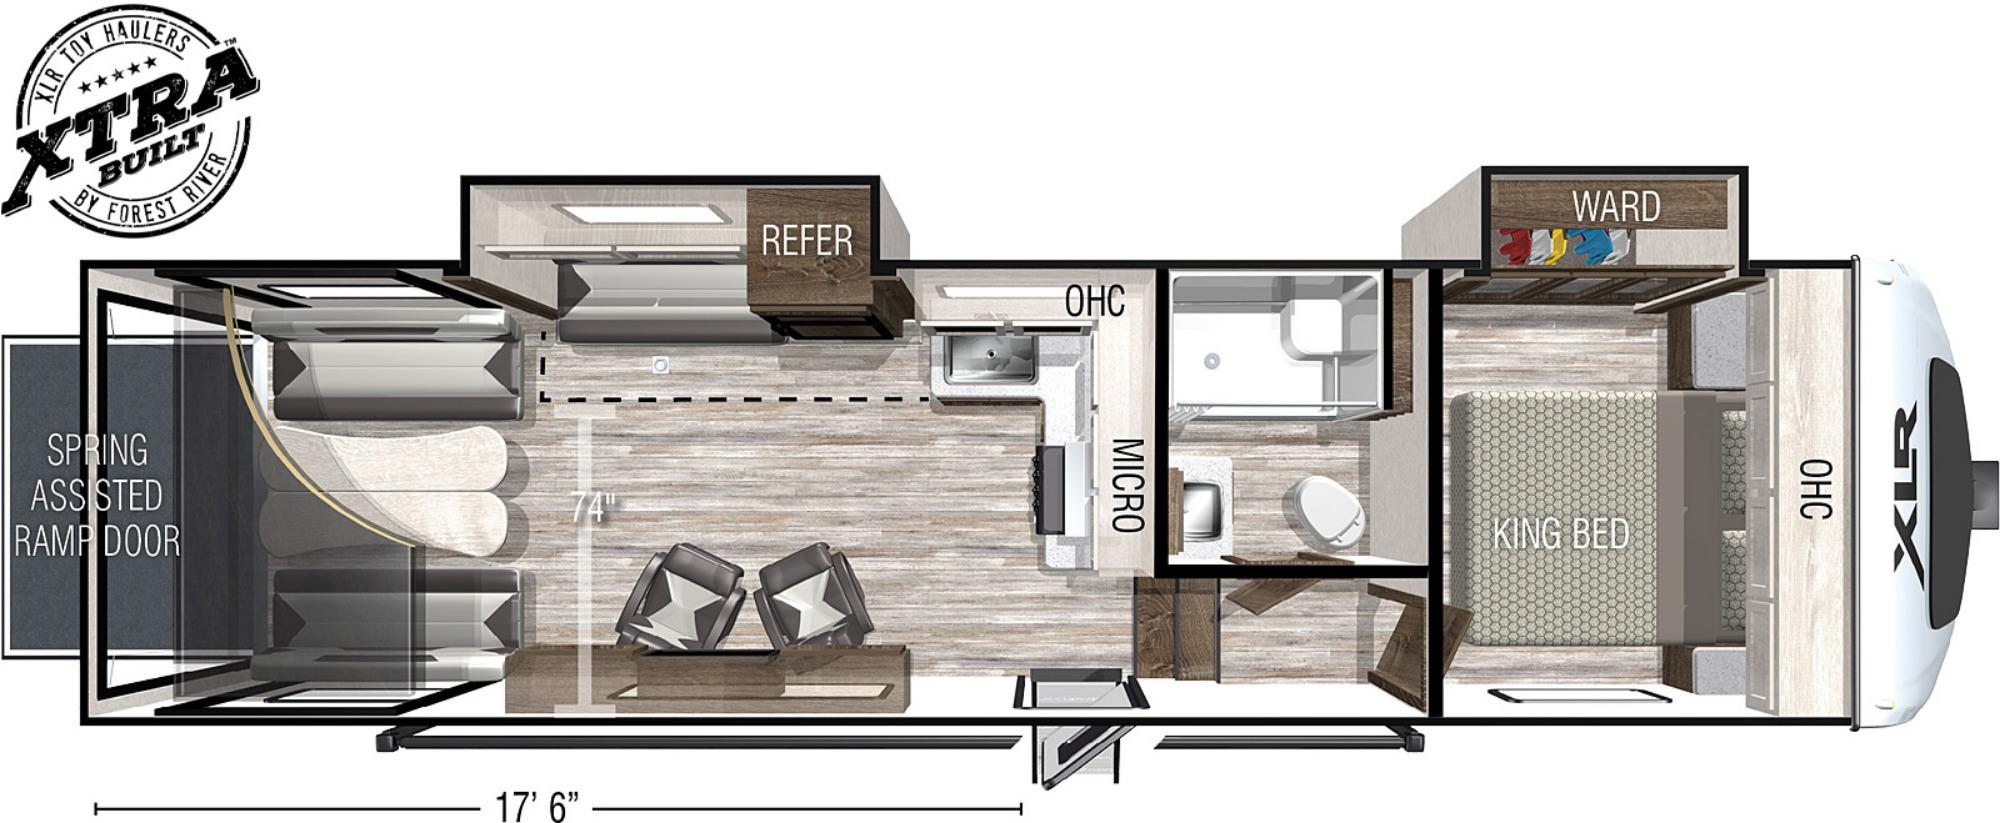 View Floor Plan for 2022 FOREST RIVER XLR NITRO 28DK5